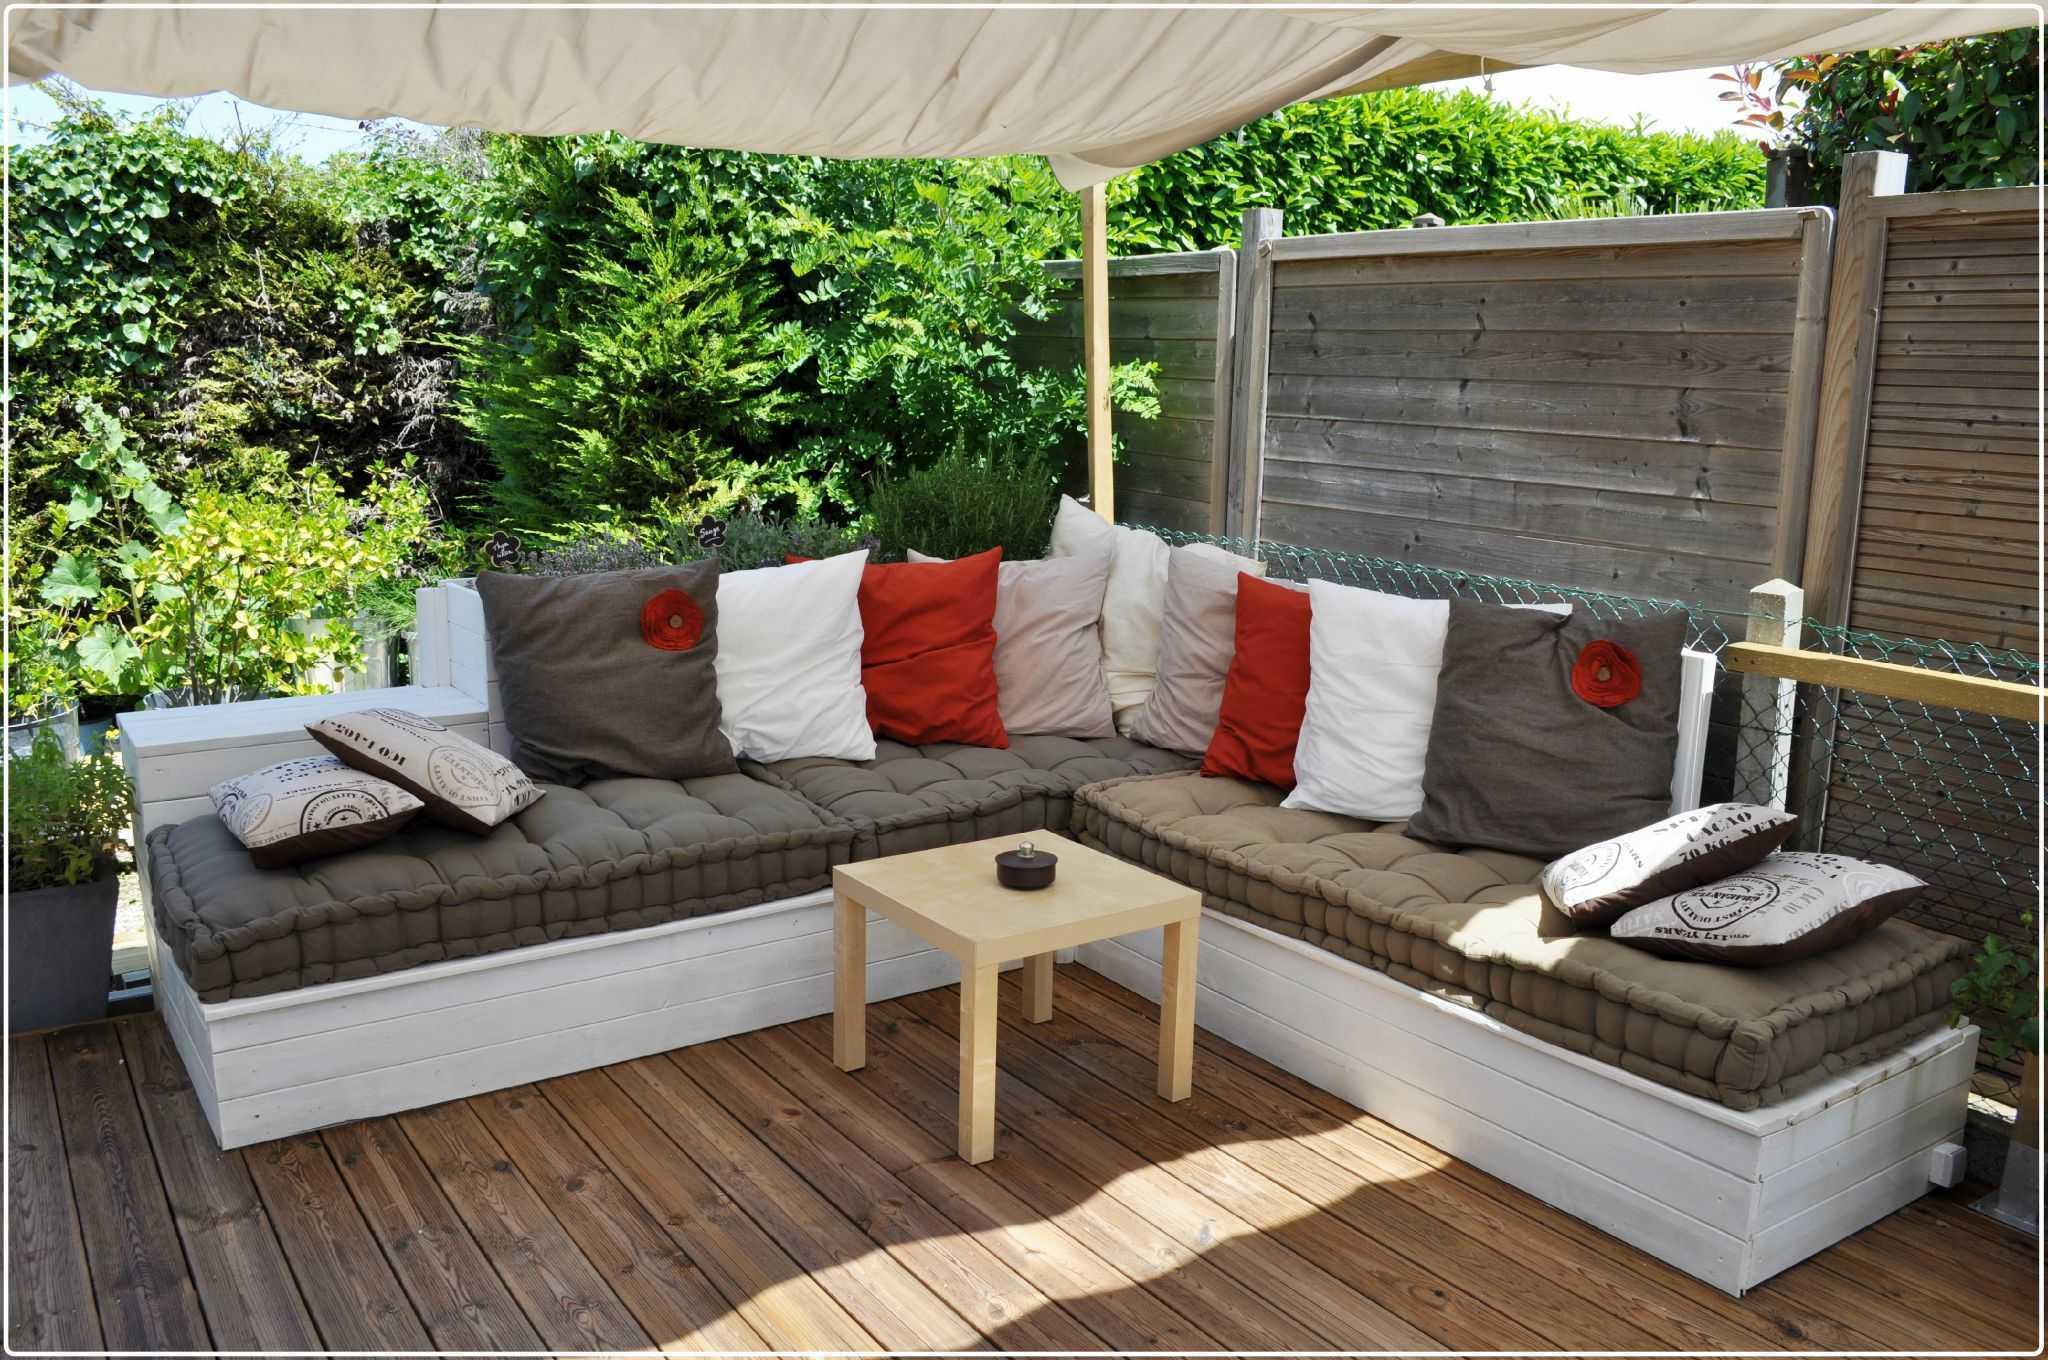 Creer son salon de jardin en bois - Abri de jardin et ...